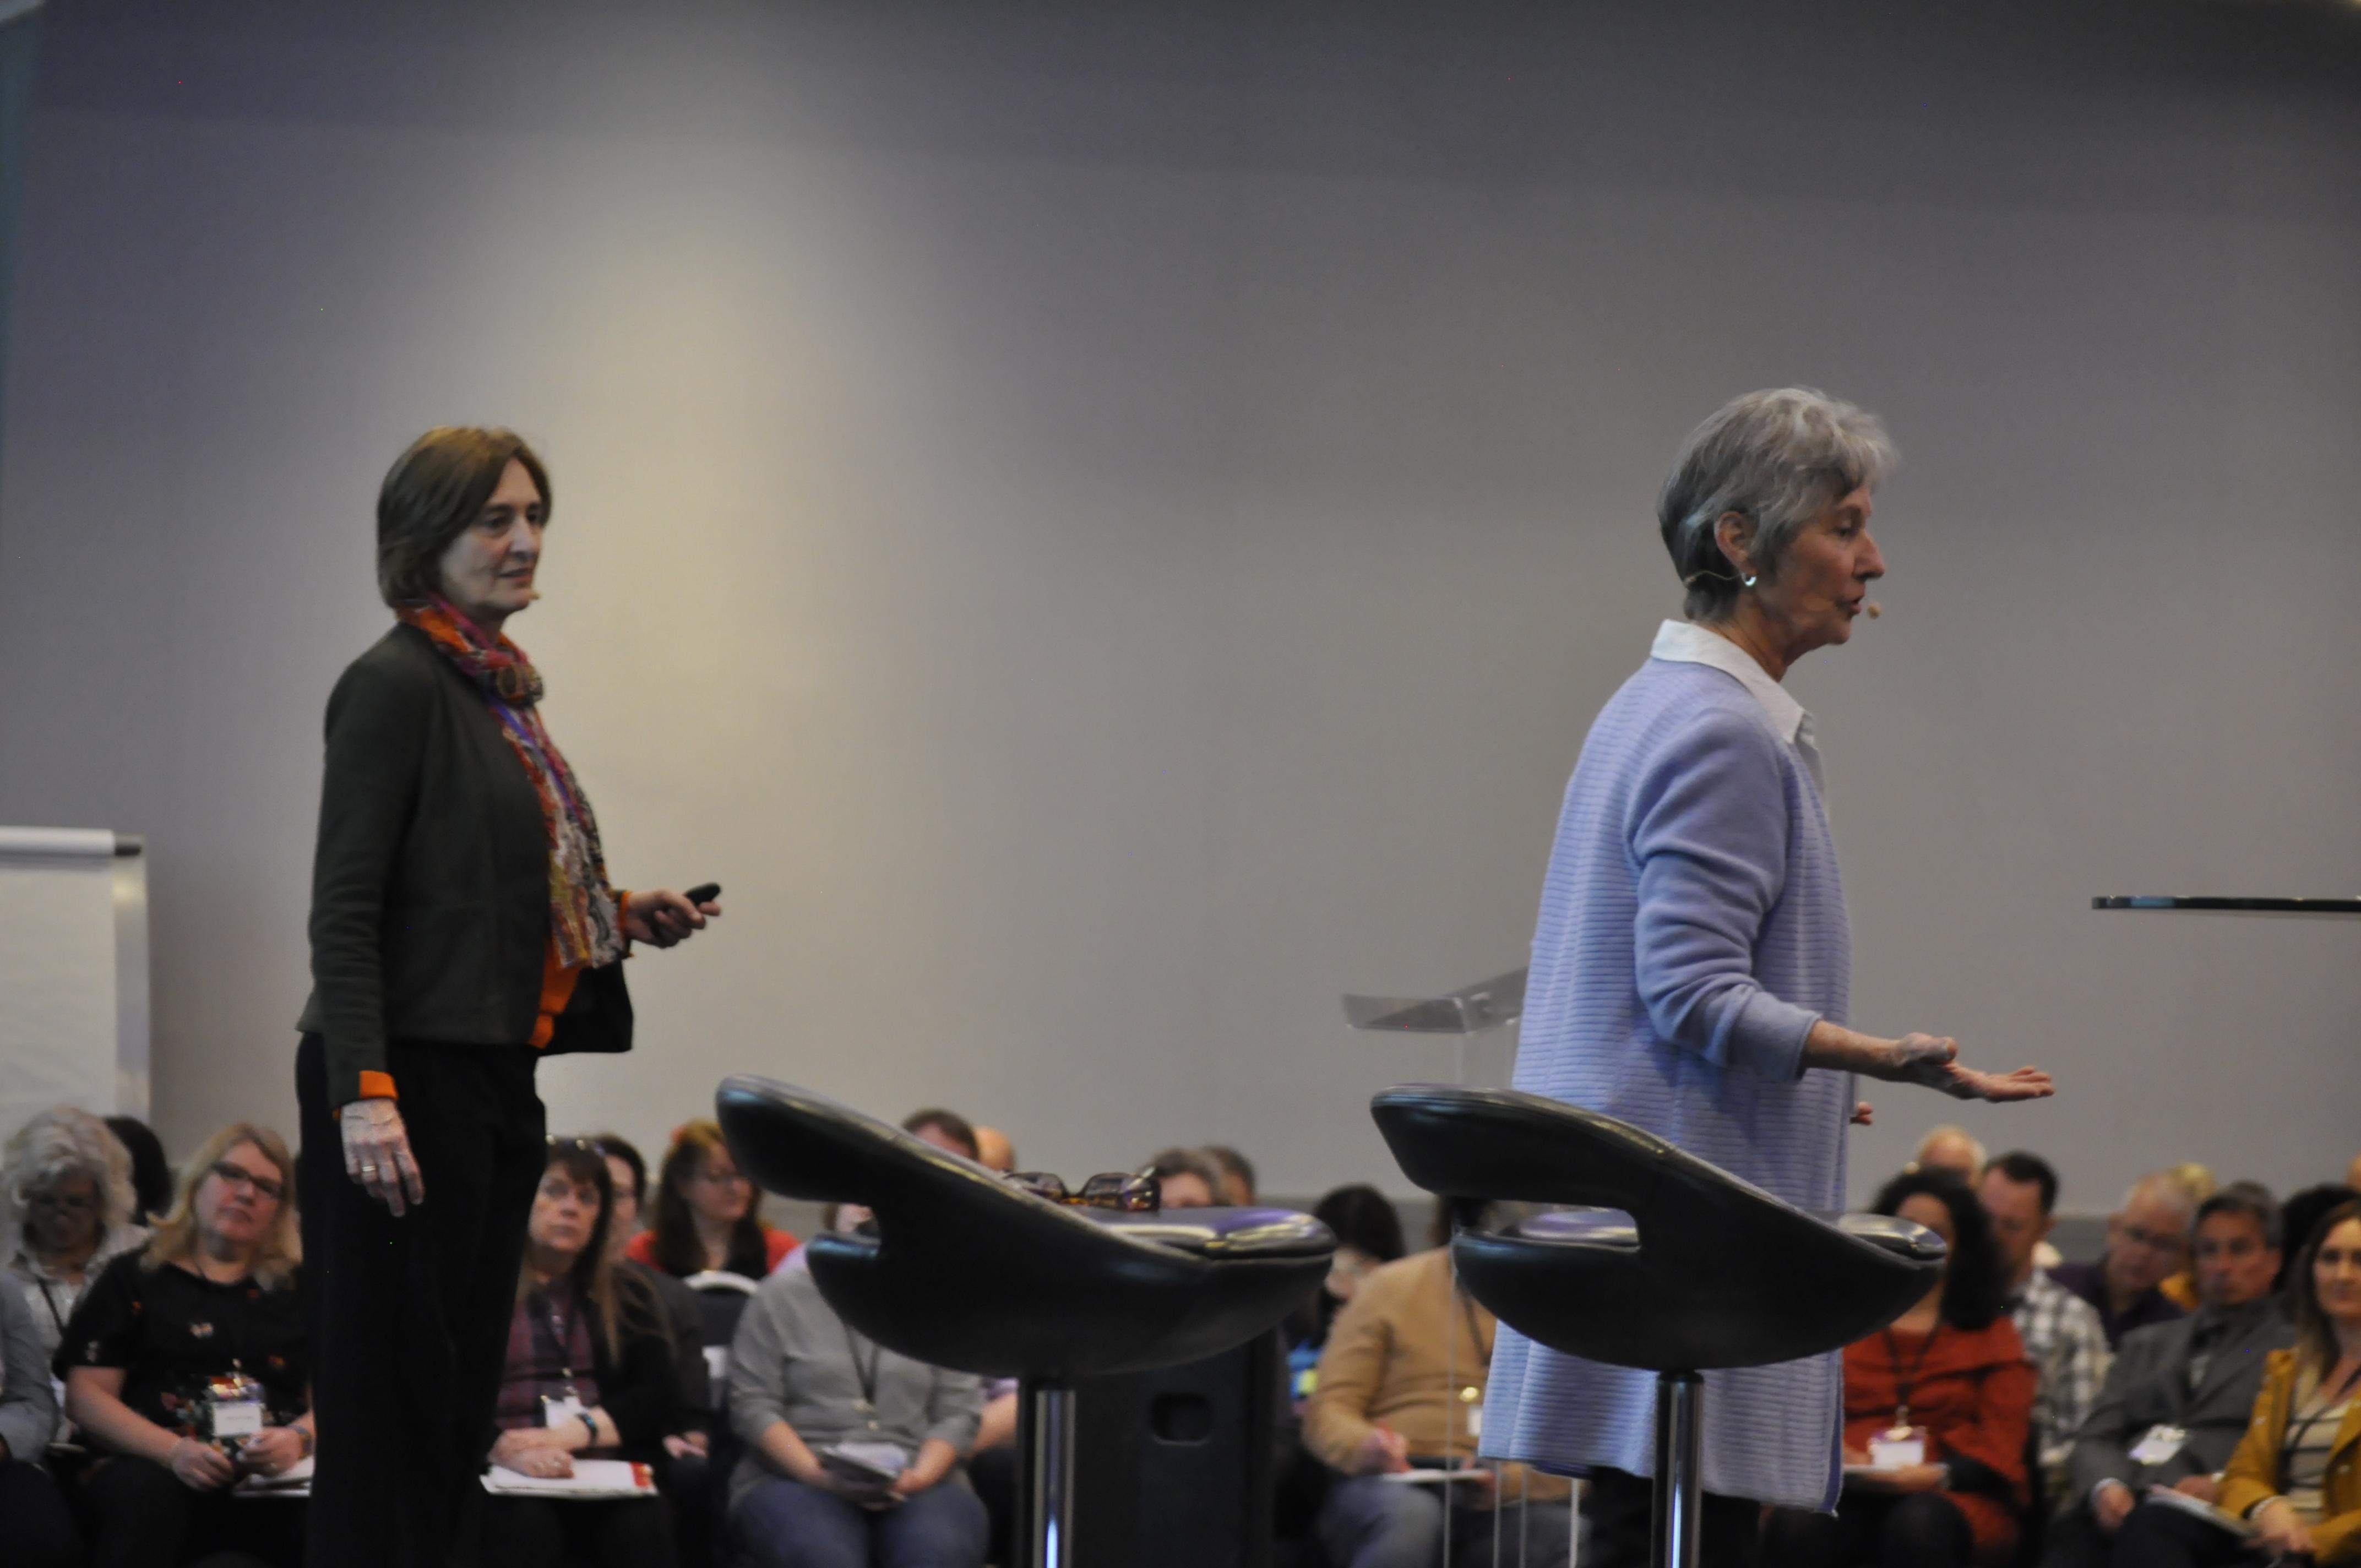 Judith Lowe and Judith DeLozier